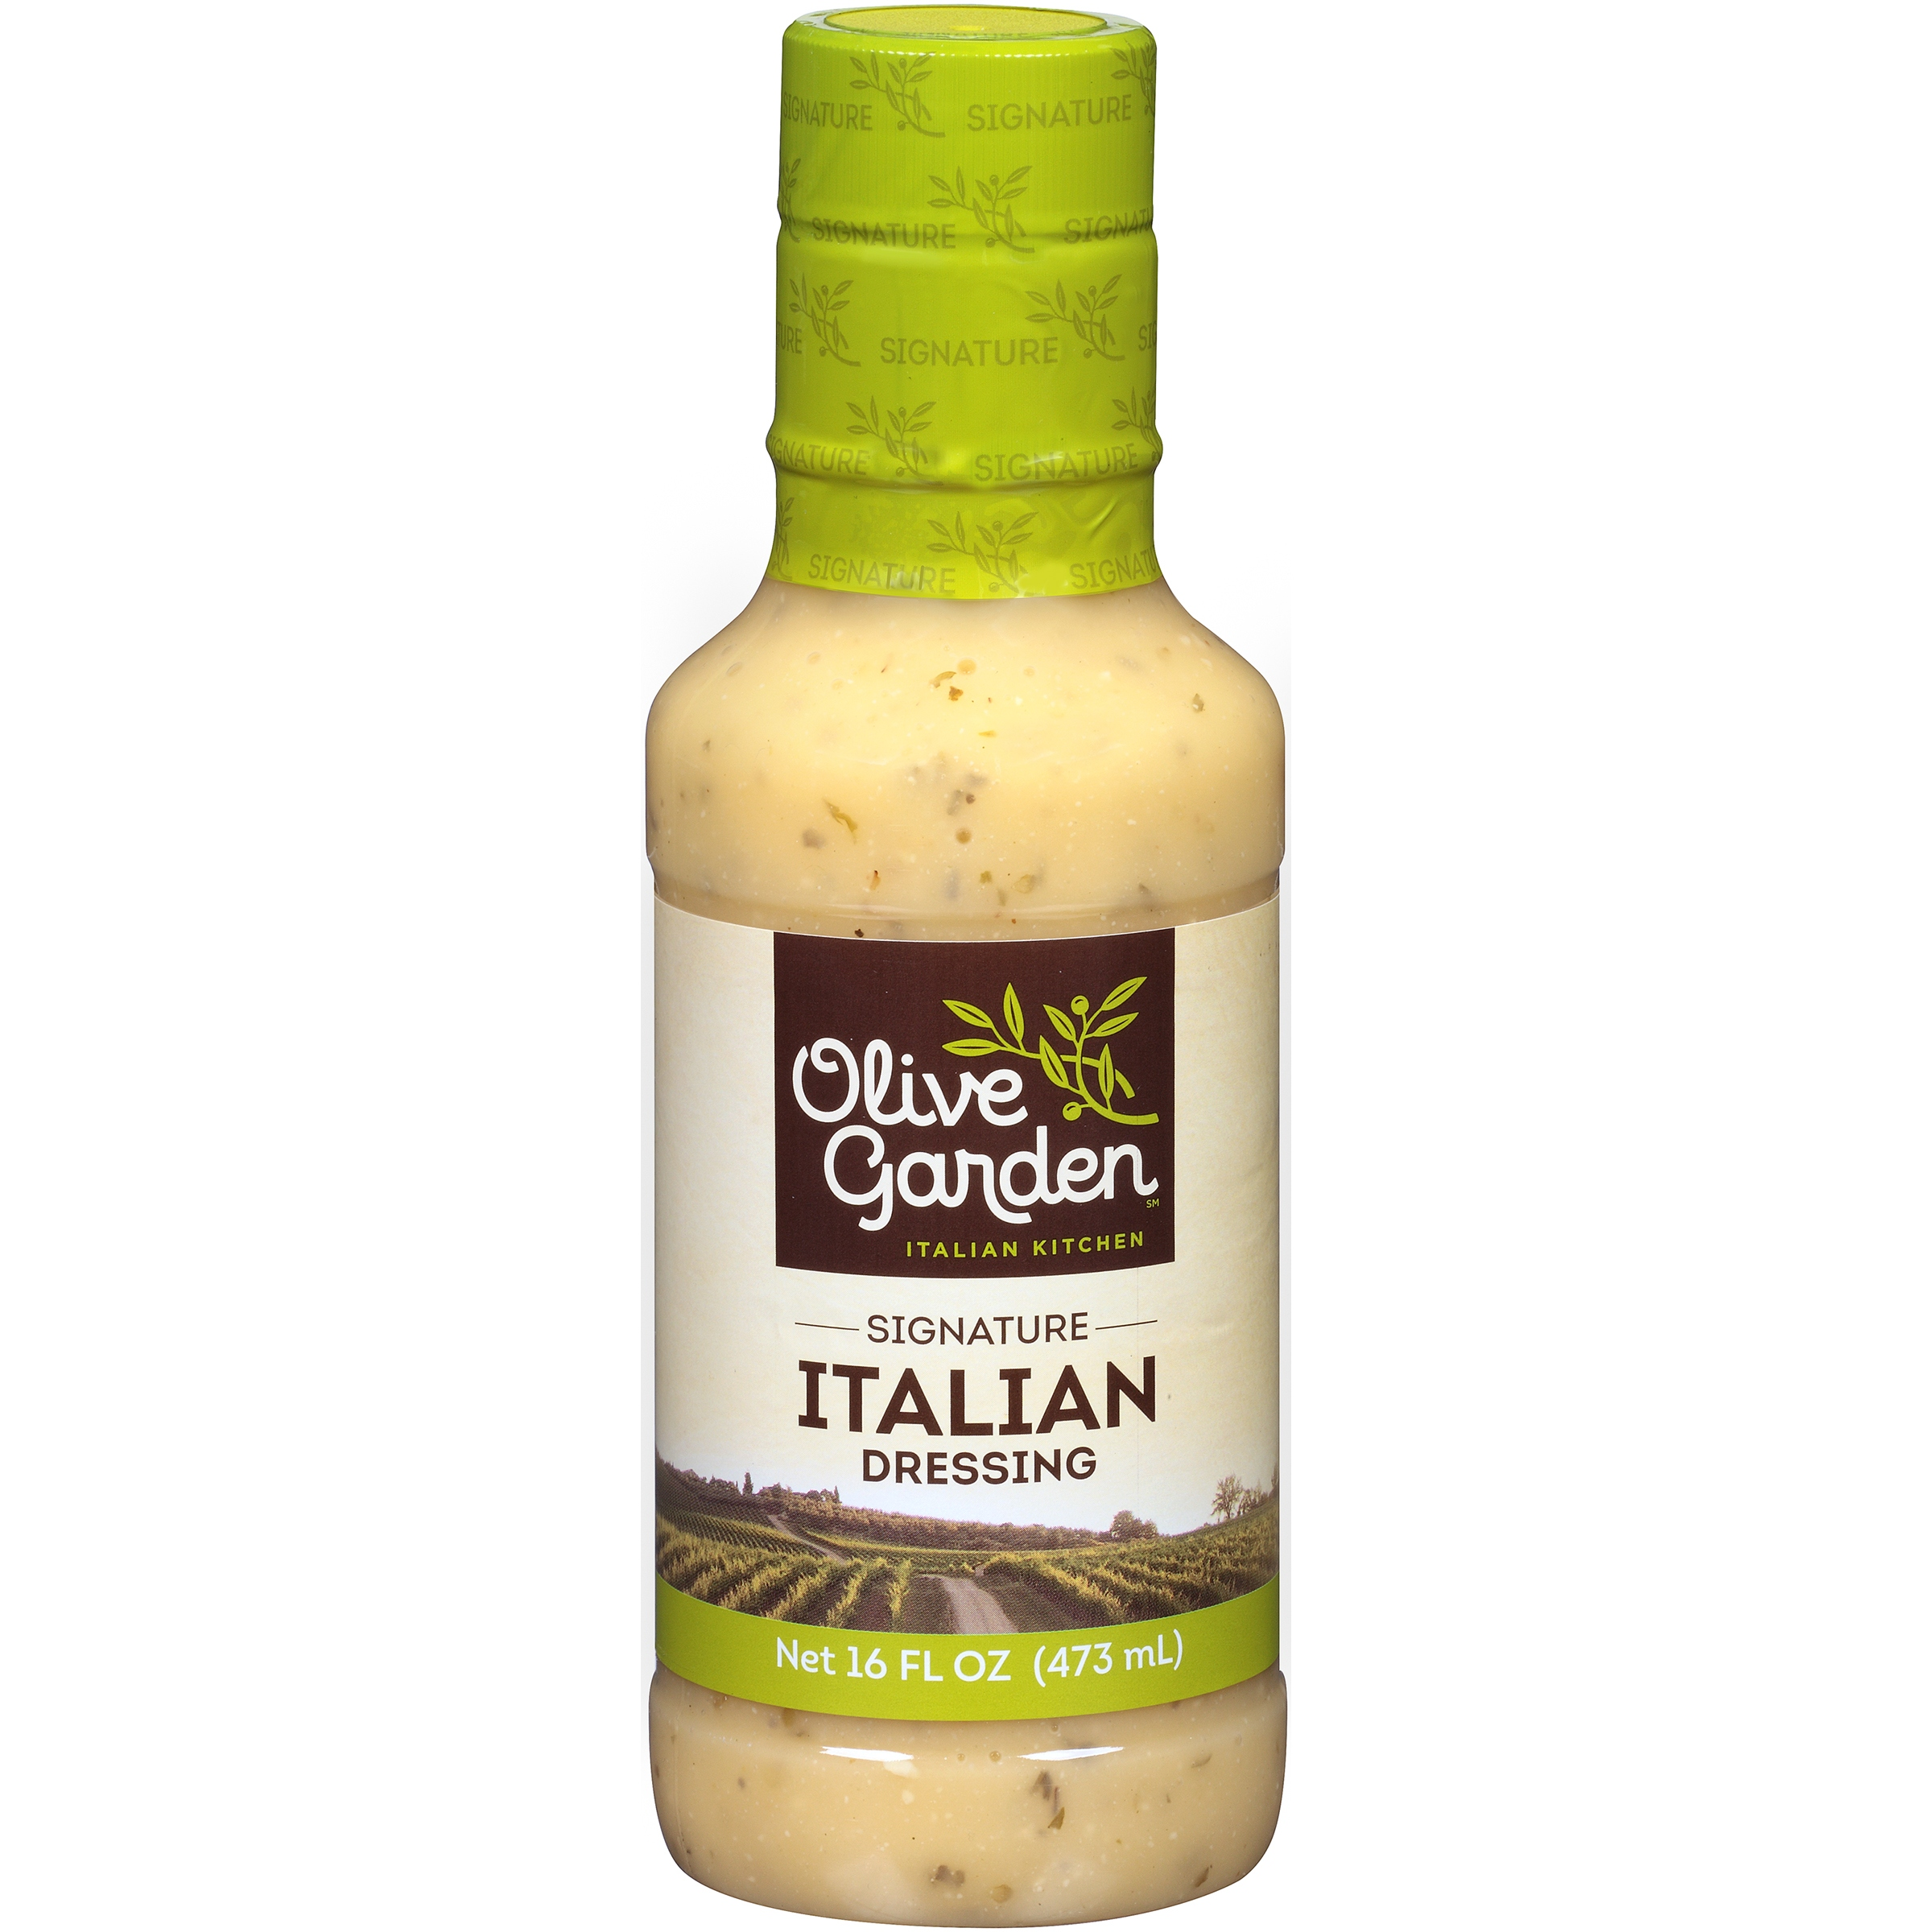 olive garden� signature italian dressing 16 fl oz bottle